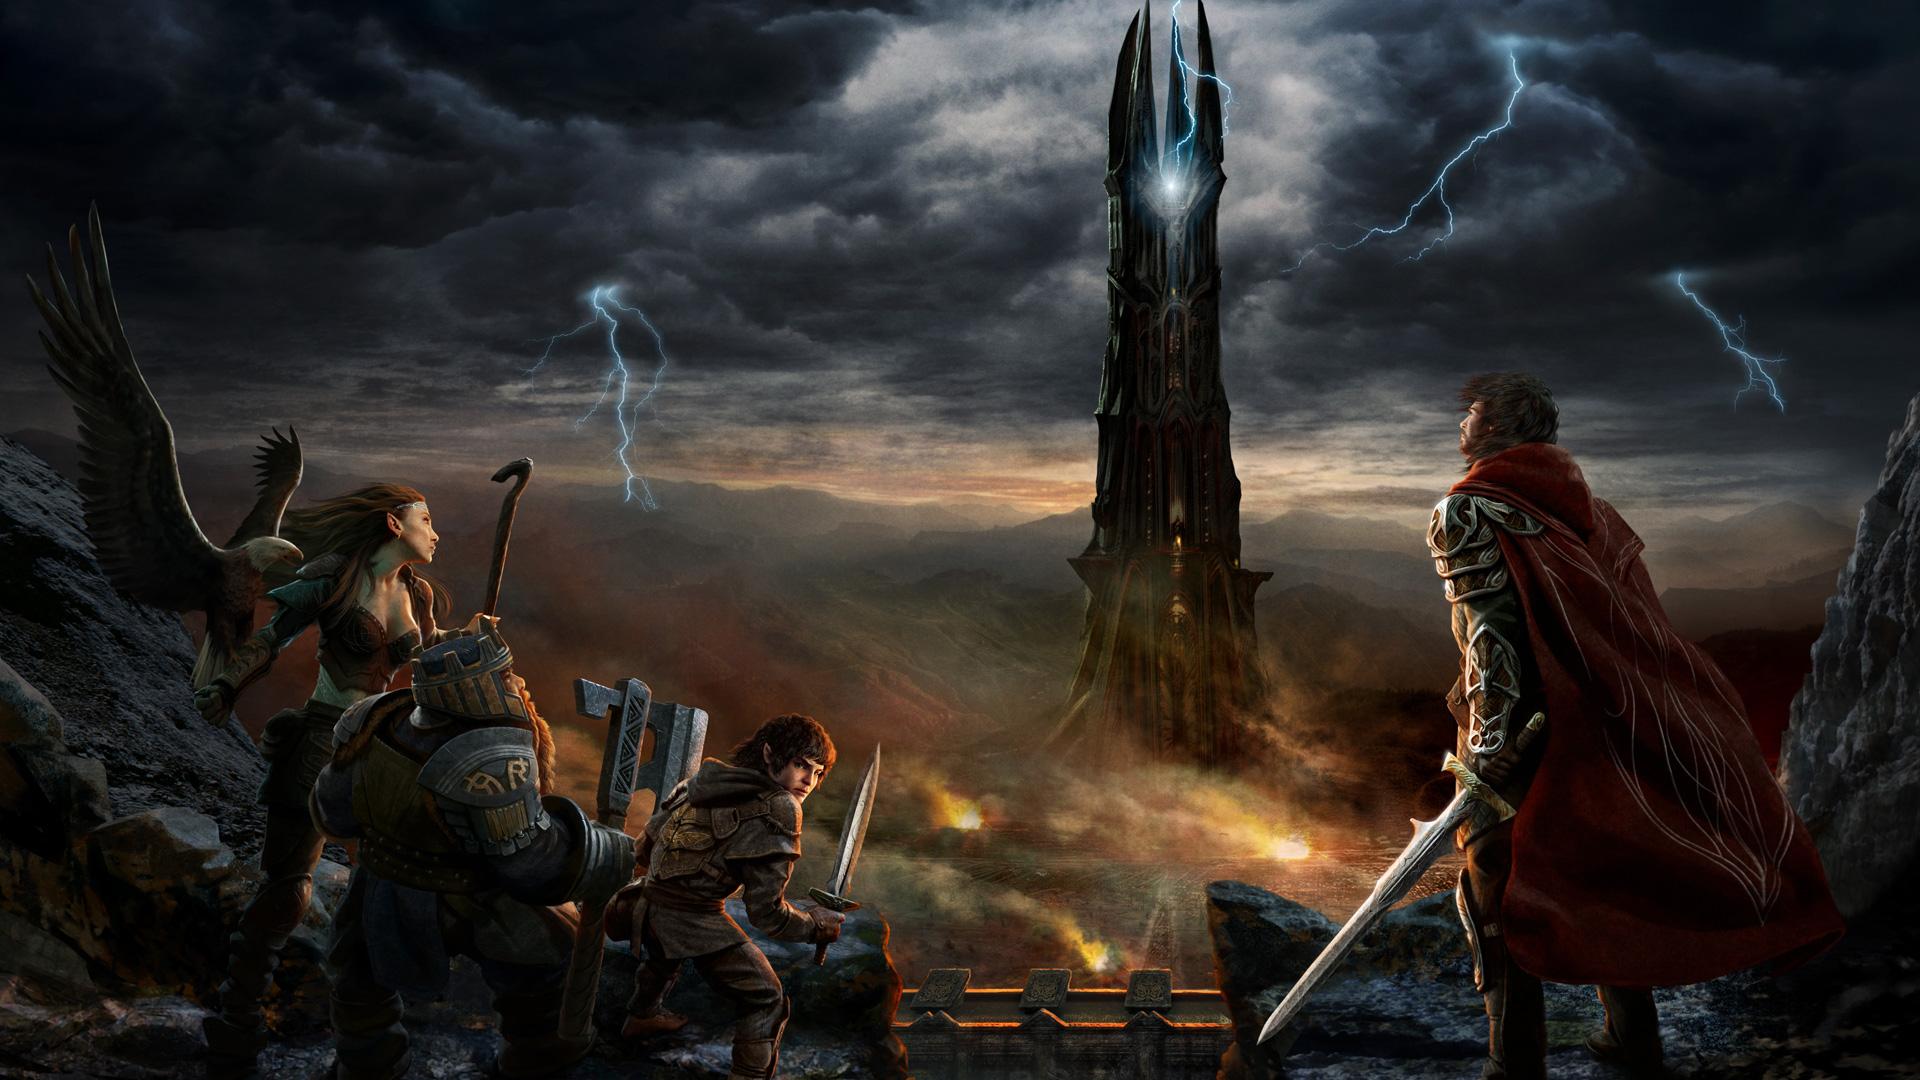 Lord Of The Rings HD-wallpaper-30.jpg